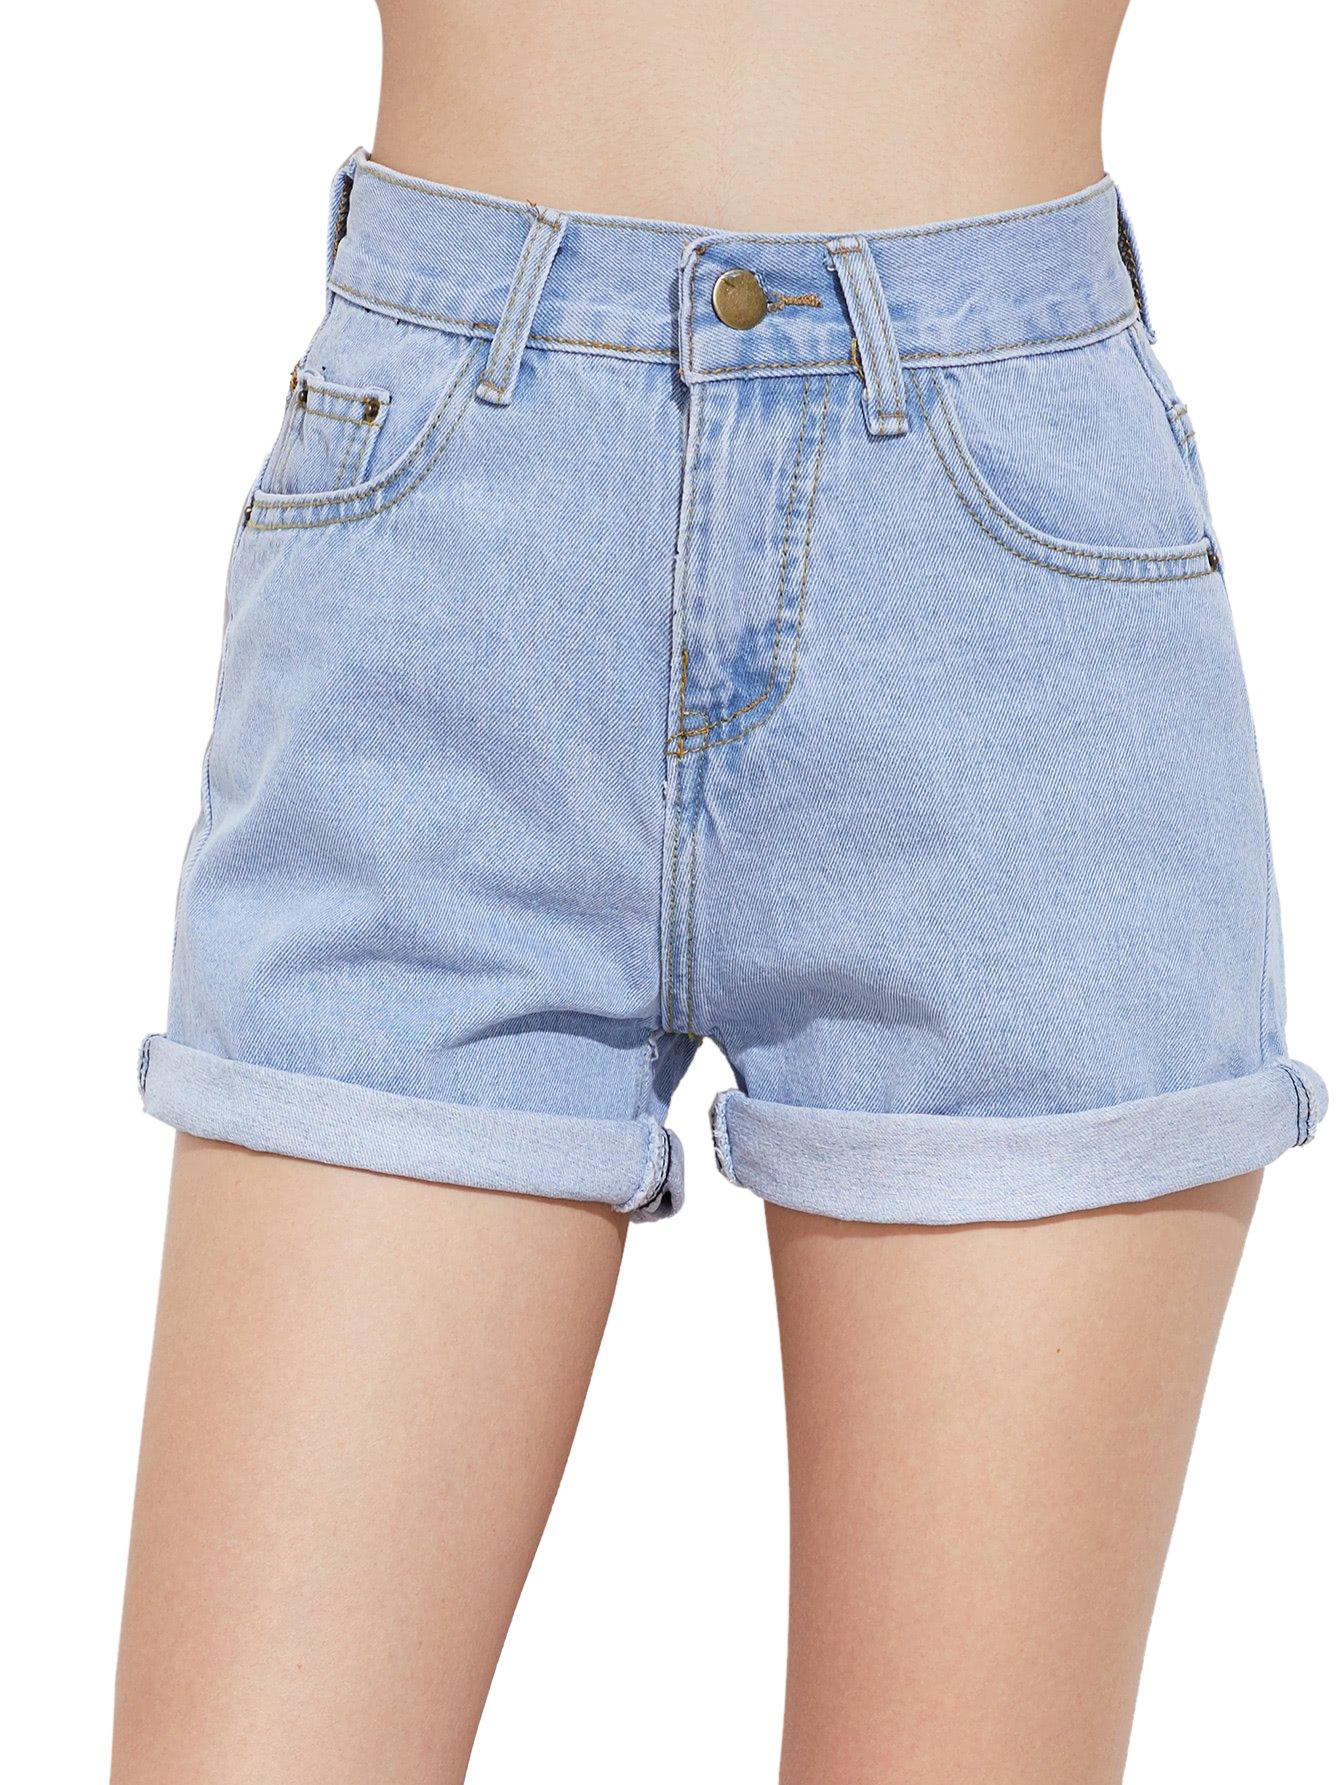 SweatyRocks Women's Retro High Waisted Rolled Denim Jean Shorts with Pockets (Small, Light Blue#4)